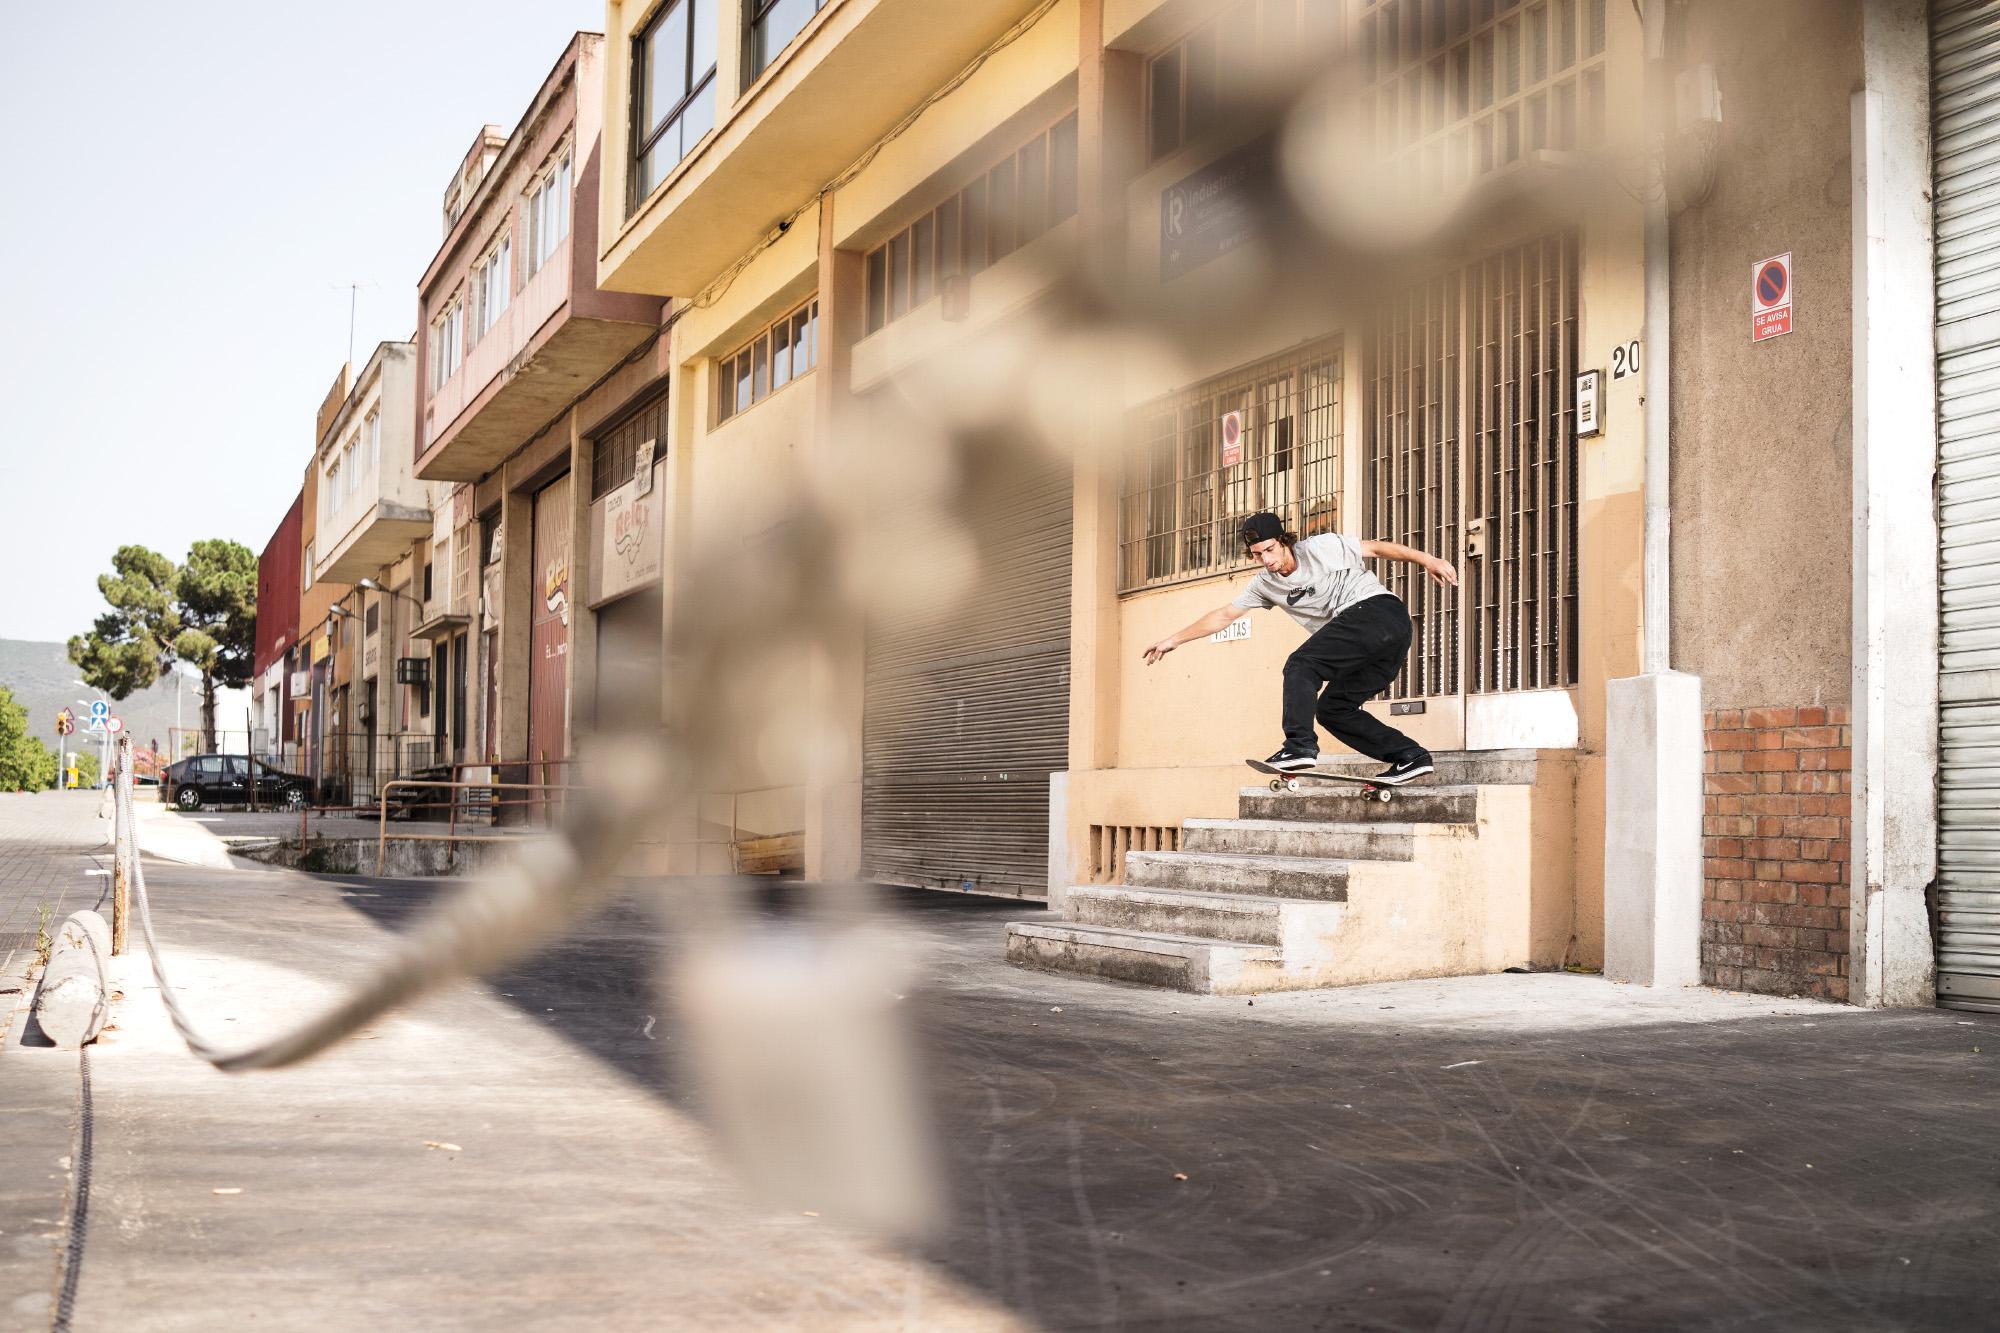 Fran_Molina_BS Tailslide_BE Skate Mag_Issue #01_Skate Pic.jpg